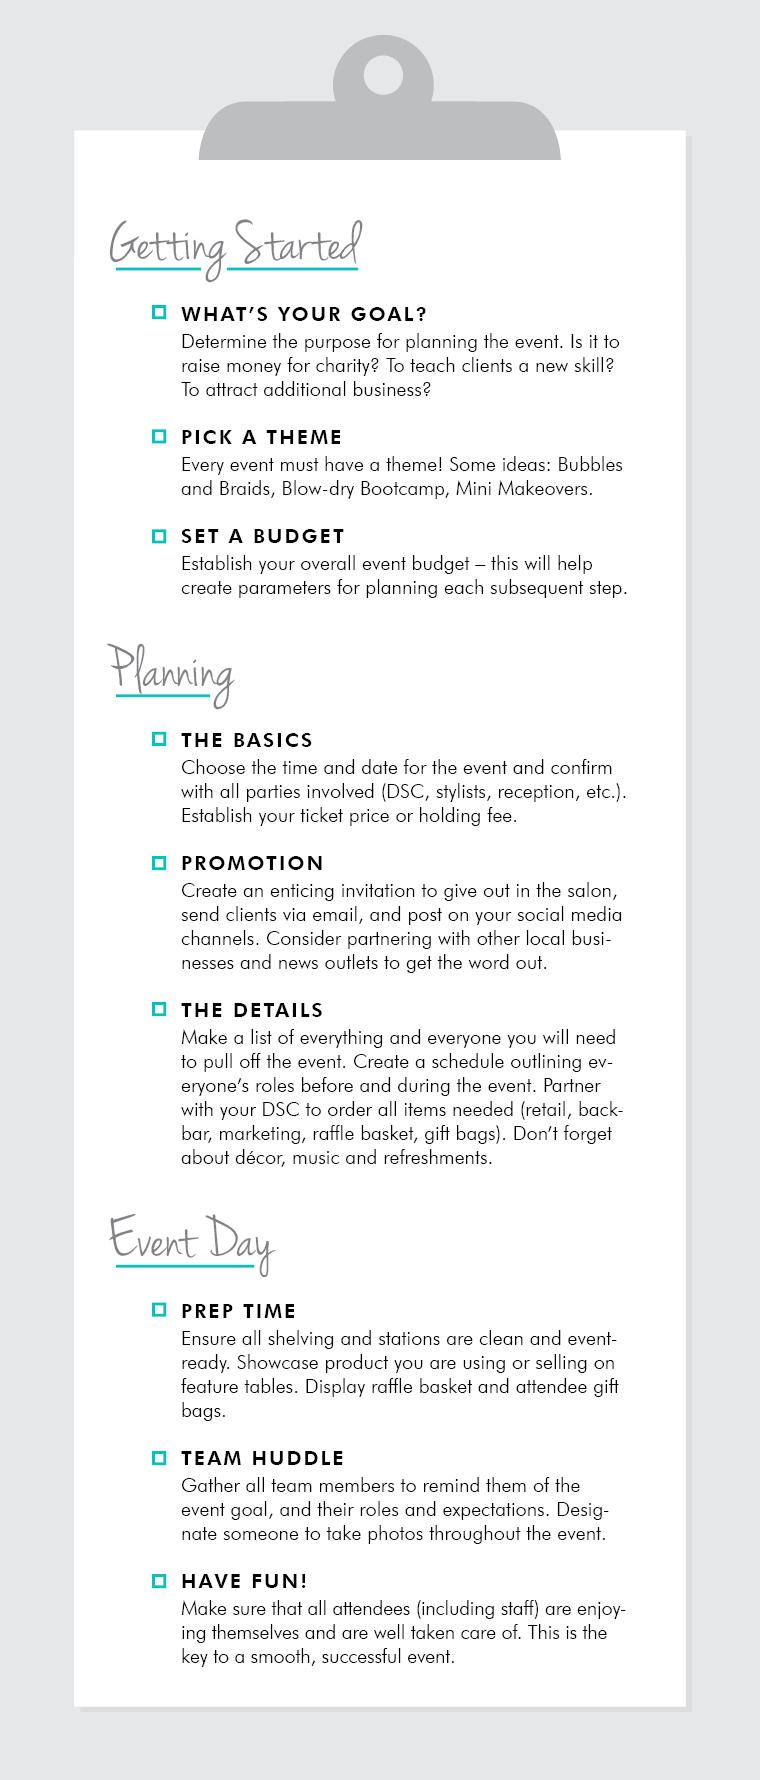 Salon Event Planning 101